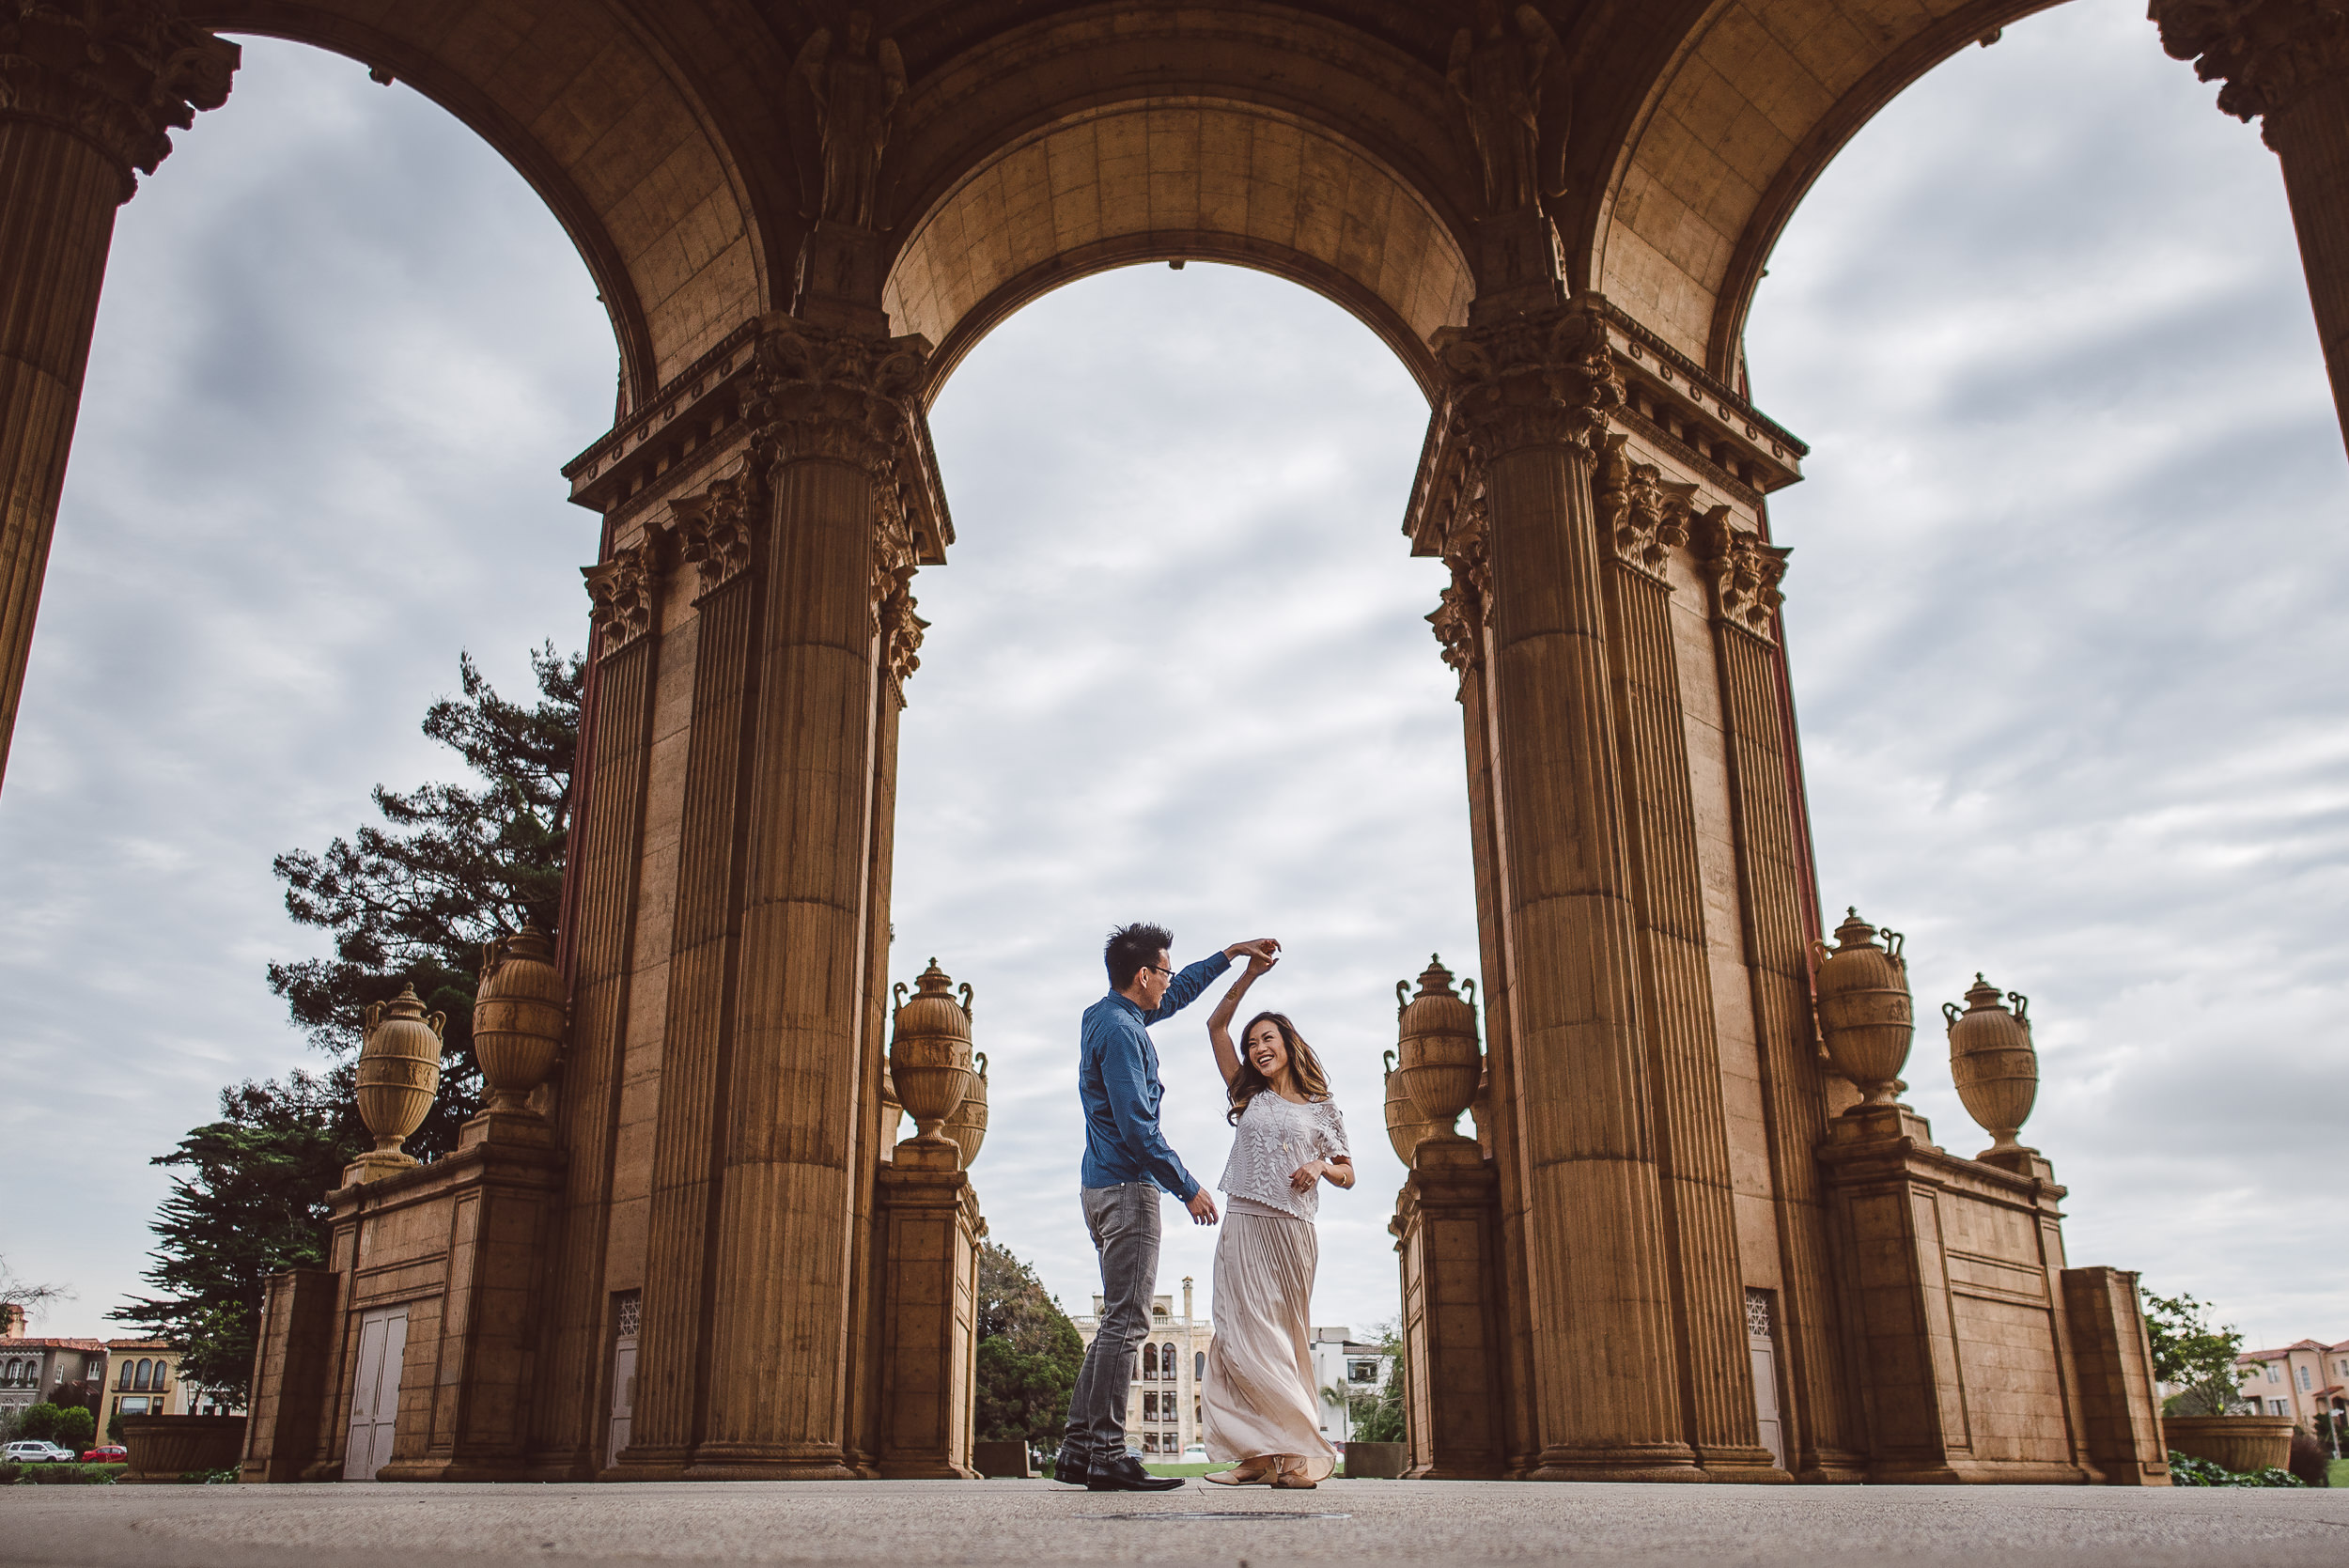 Palace-of-Fine-Arts-San-Francisco-Engagement-Photography-009.jpg